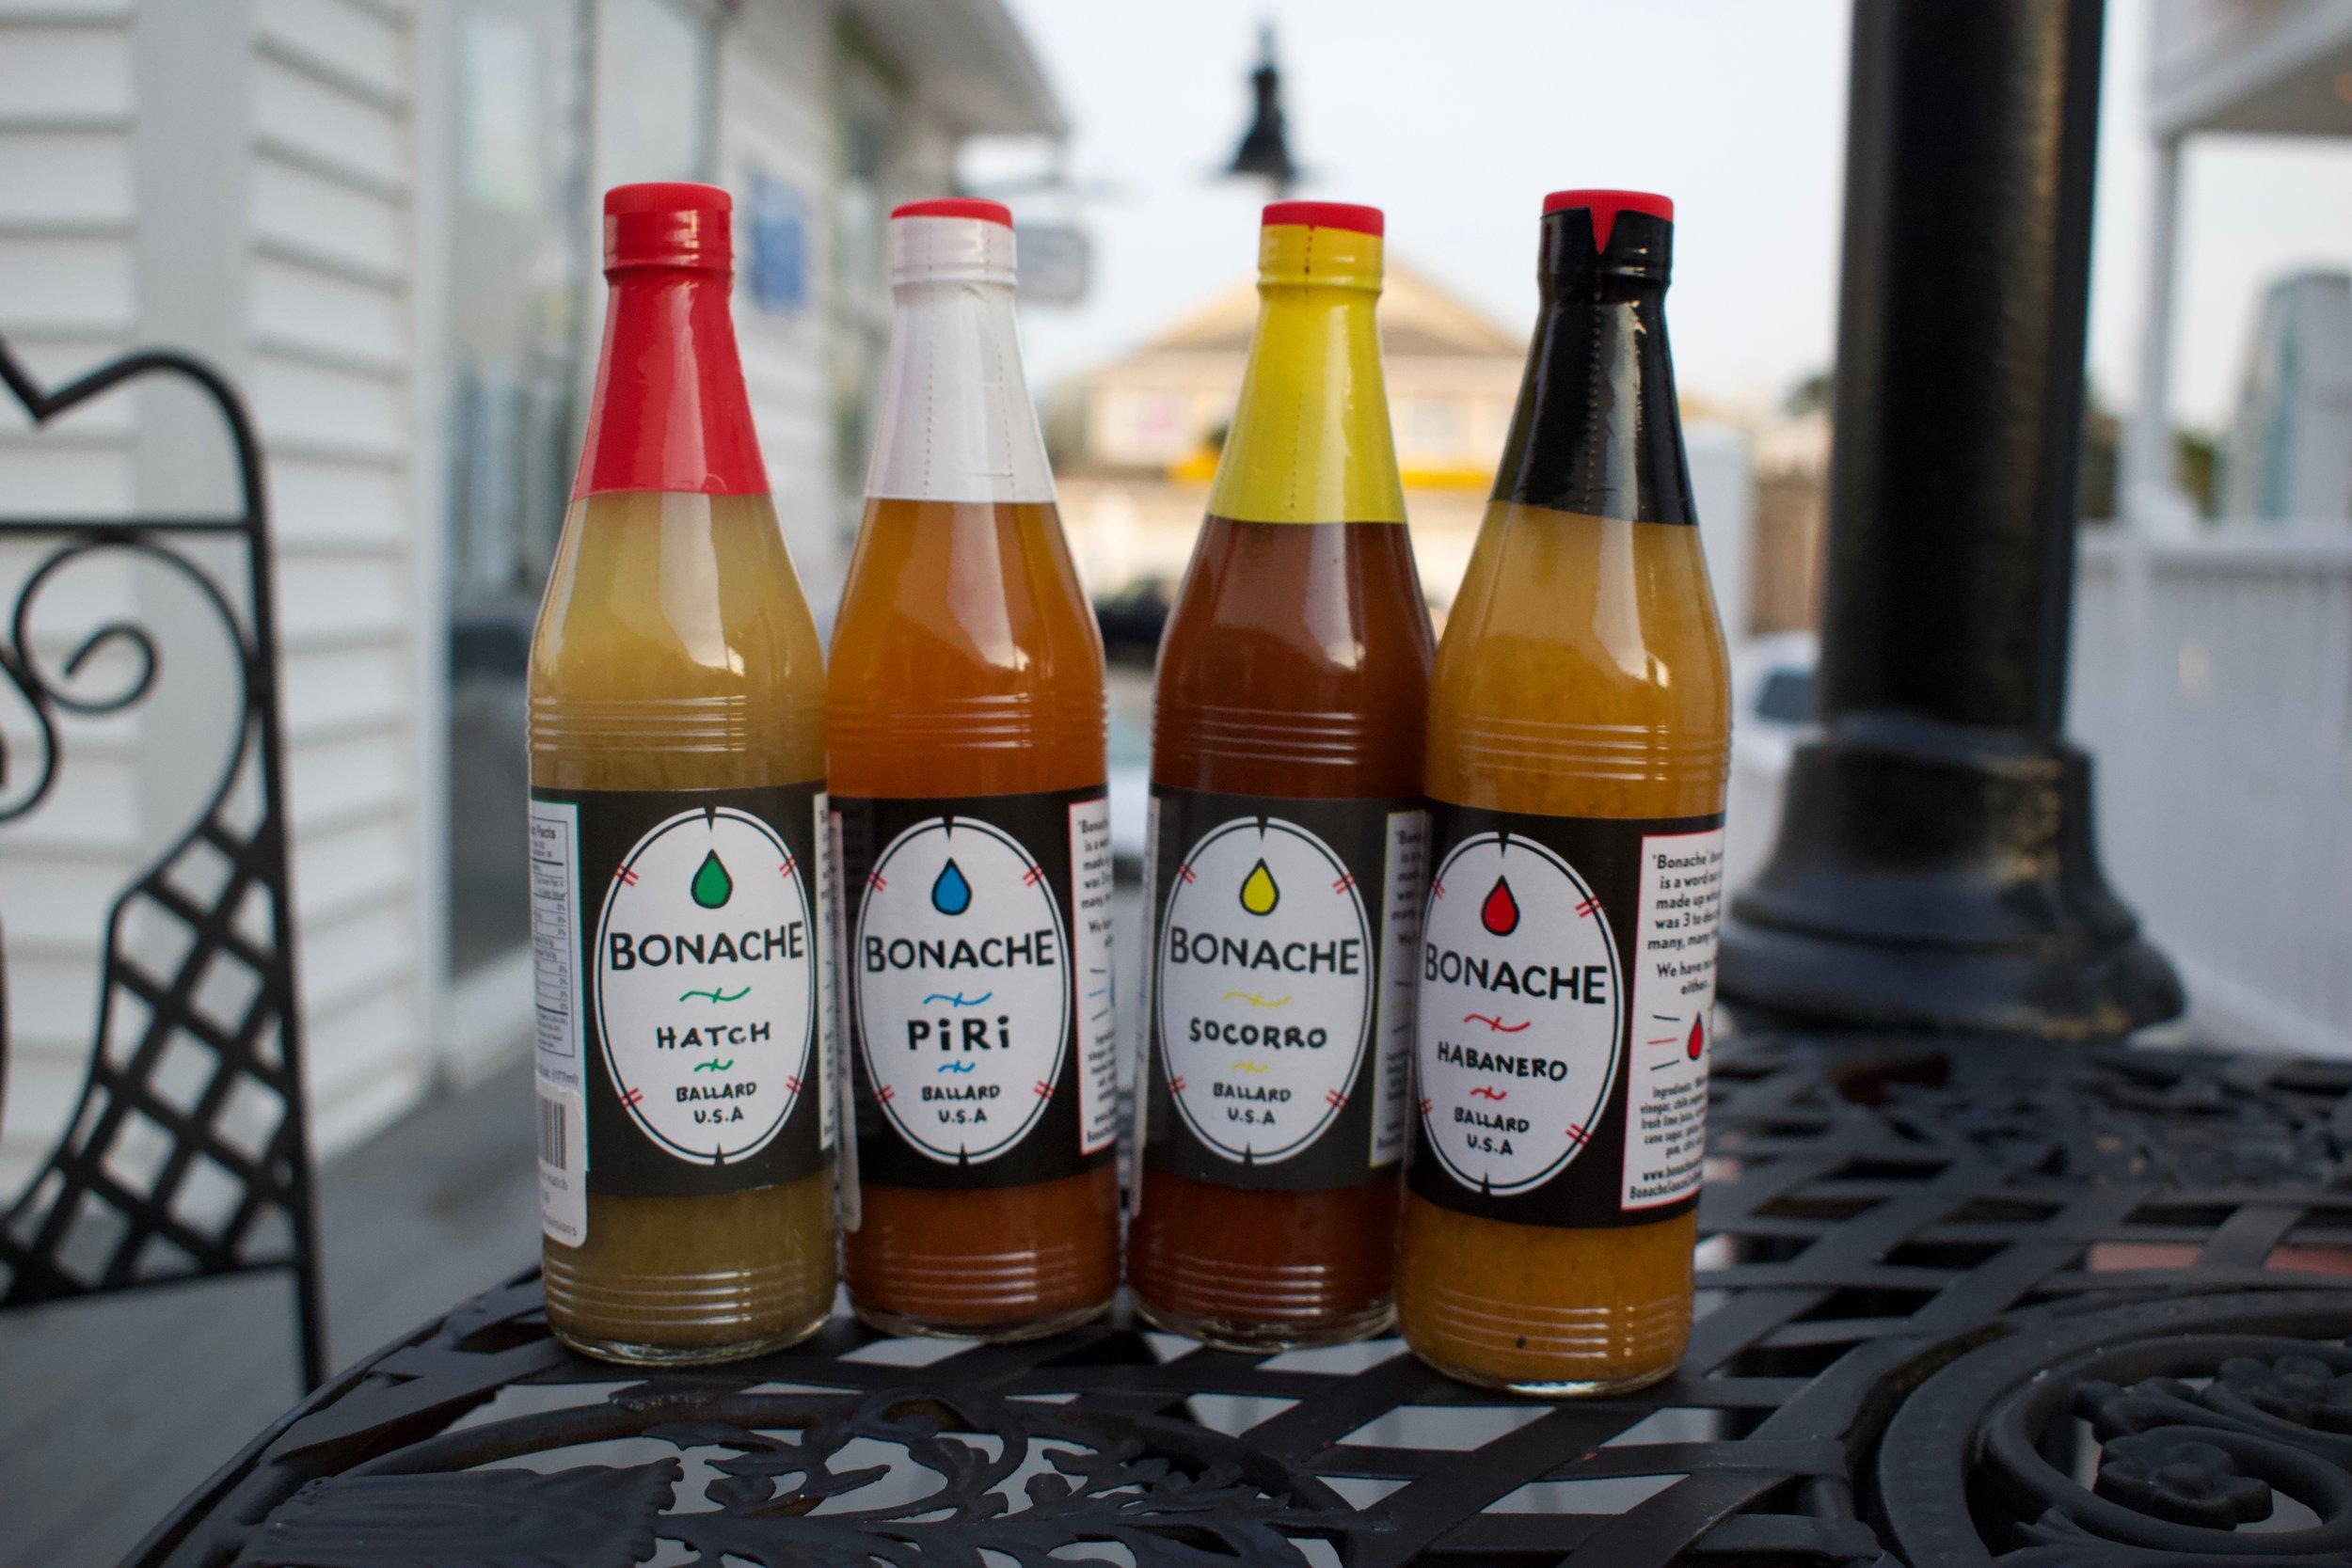 8. Bonache hot sauce in Hatch, Piri, Socorro, Habanero